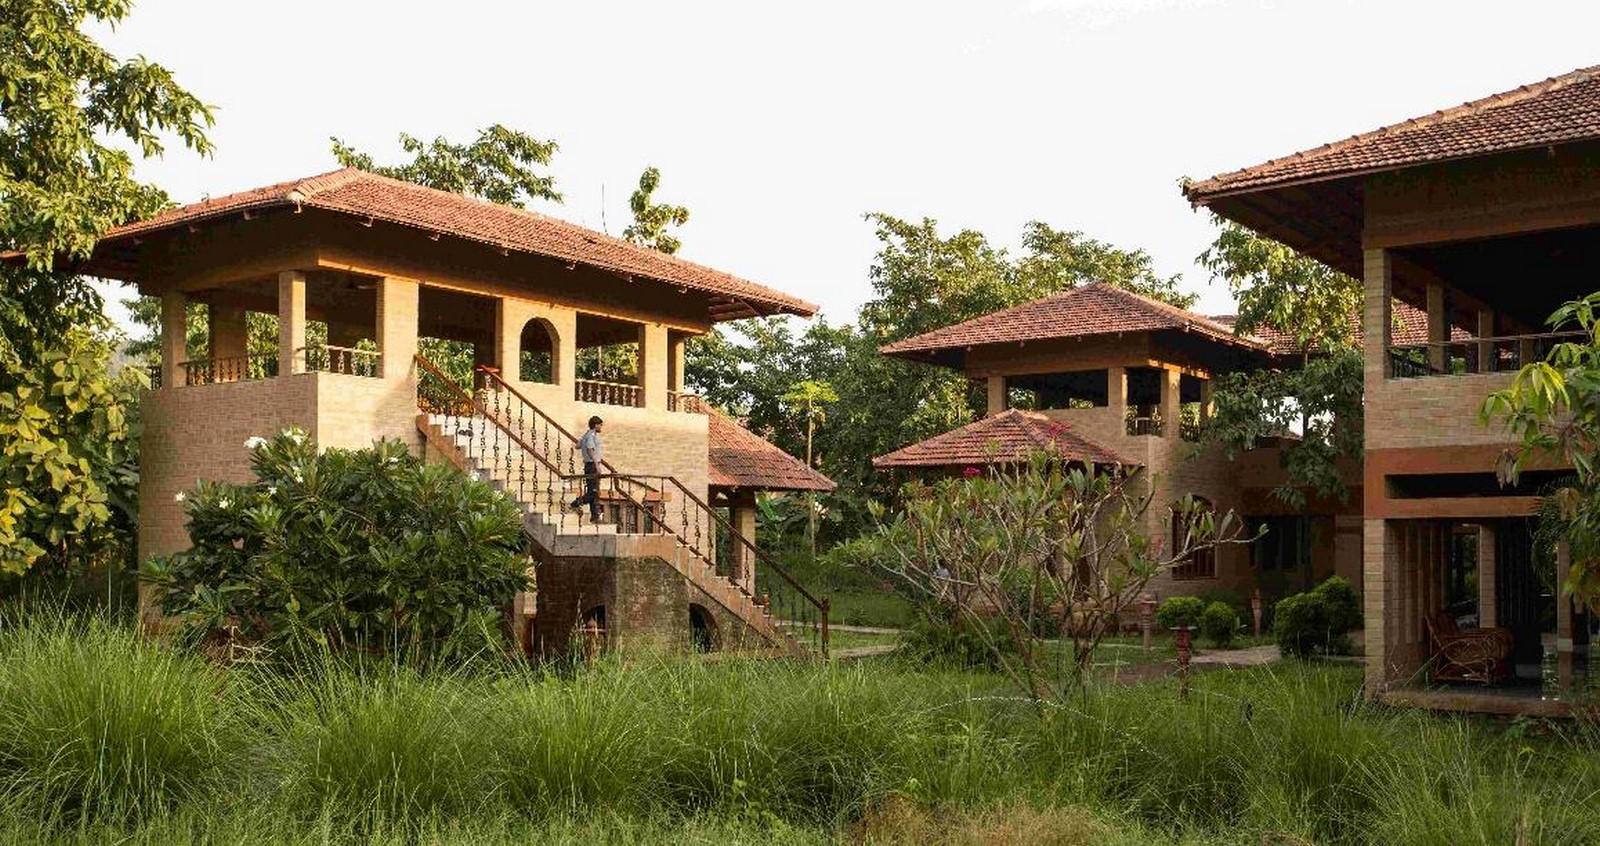 Govardhan Eco Village by Chitra Vishwanath: A Retreat for the Devotees - Sheet